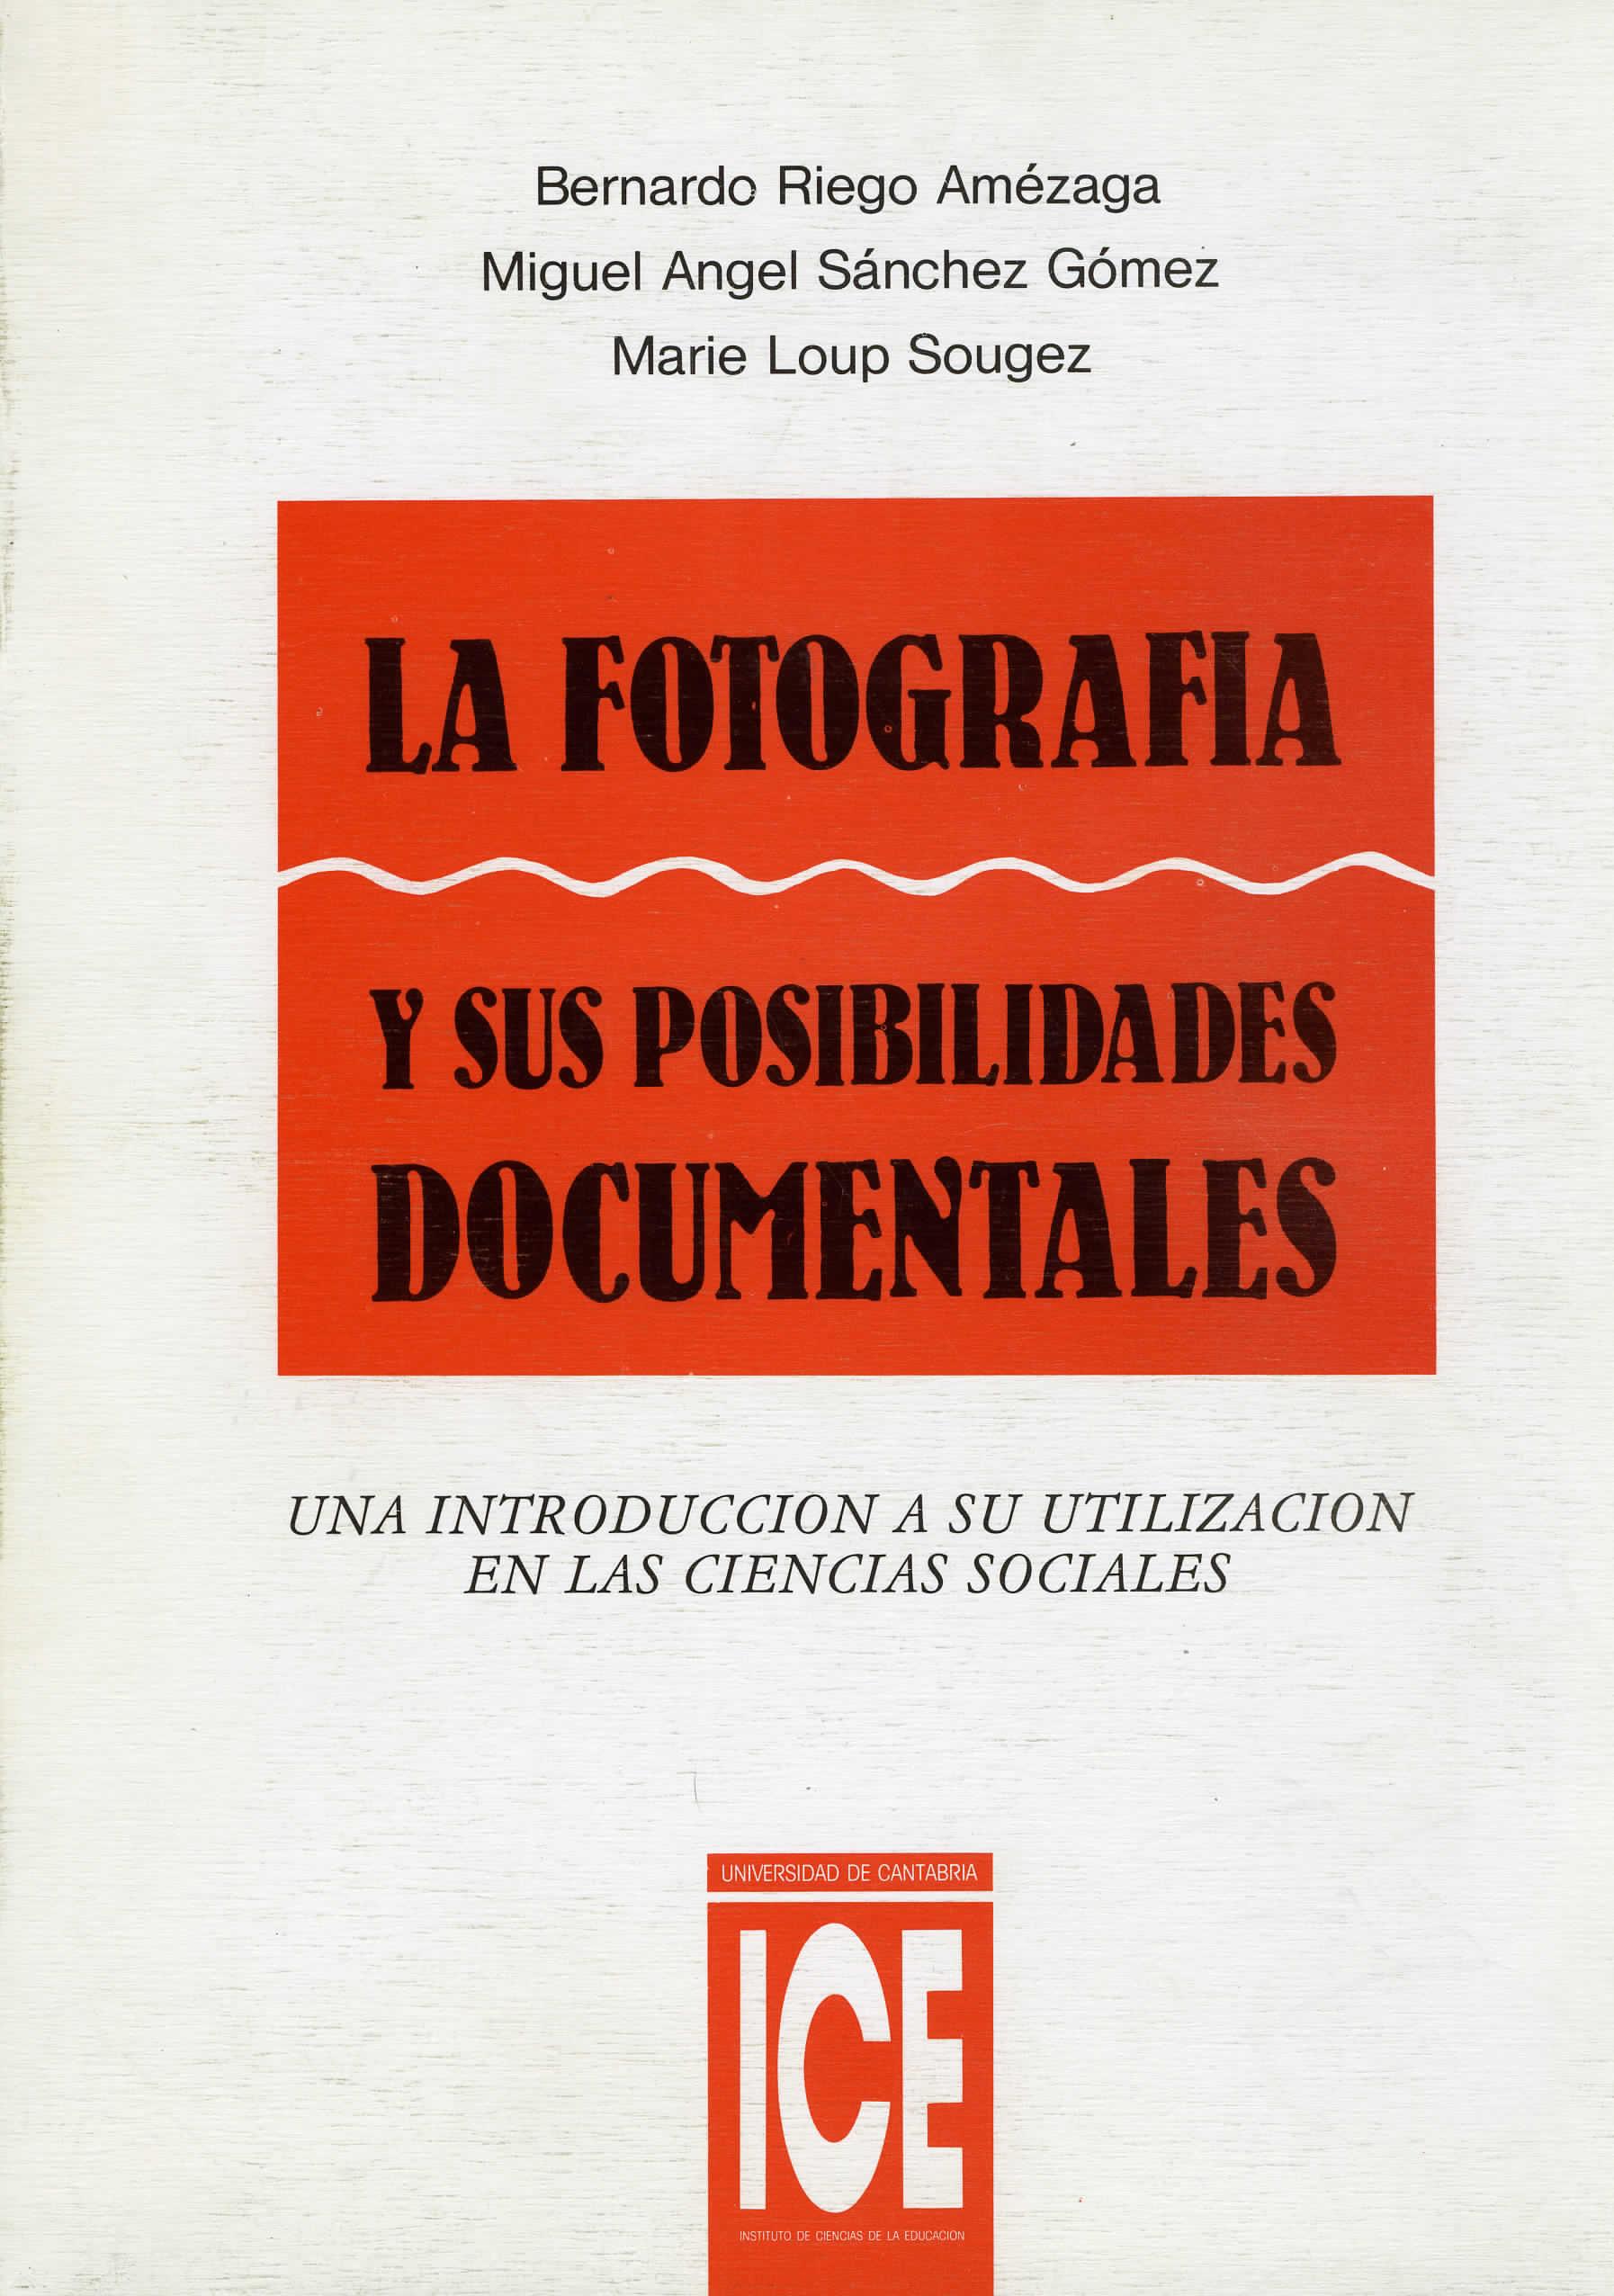 Libro ICE 1988